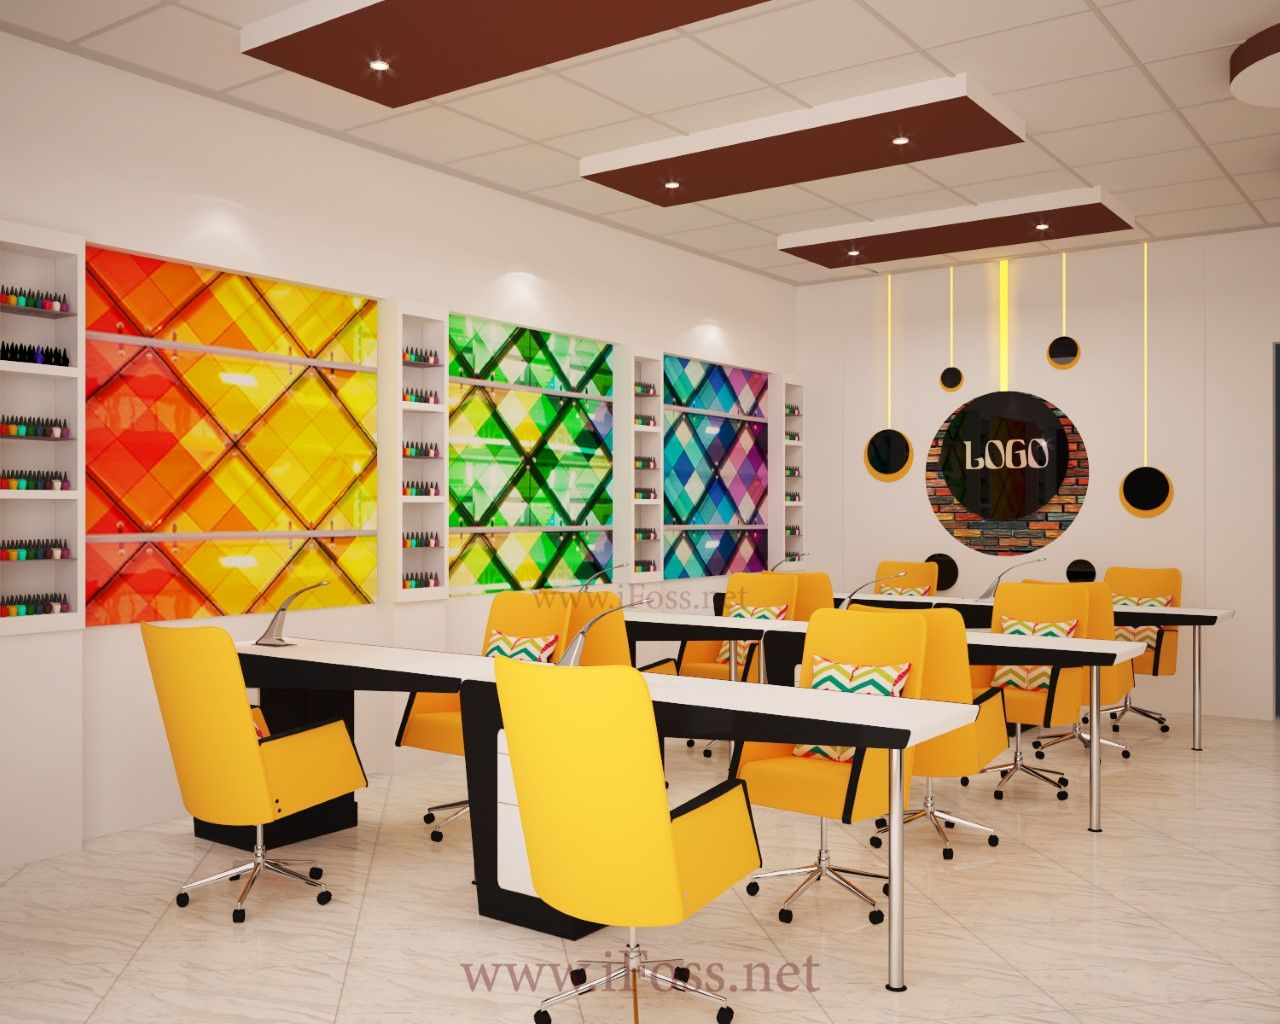 Nail Salon Design, Top Nail, Nail Salons, Beauty Salons, Manicures